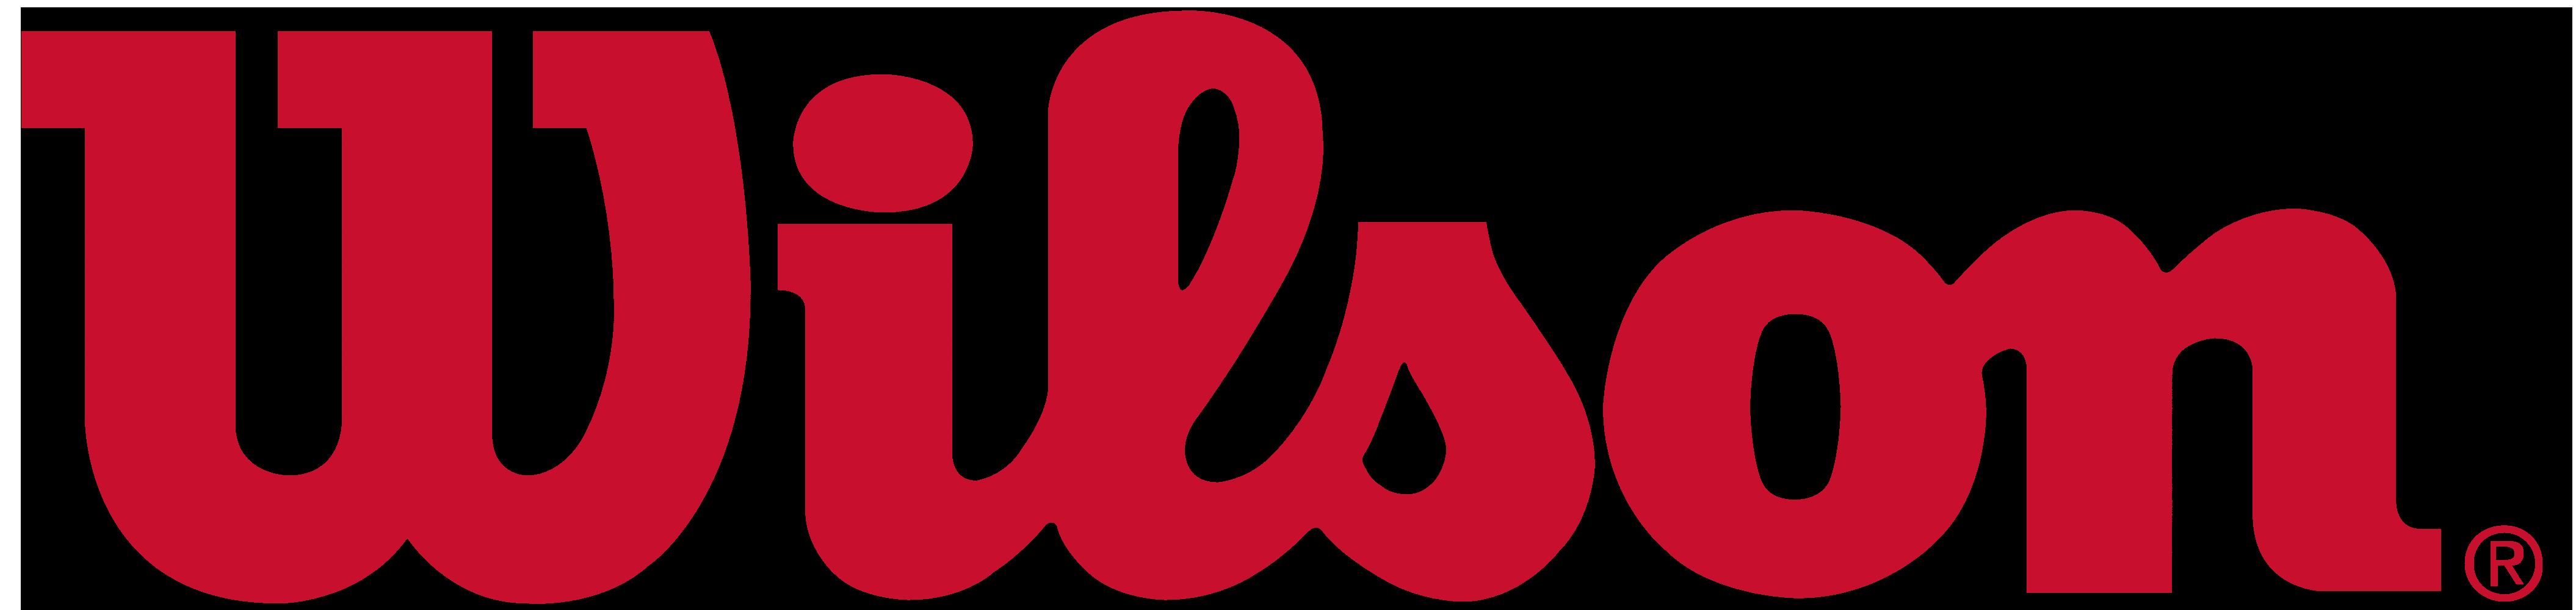 wilson � logos download